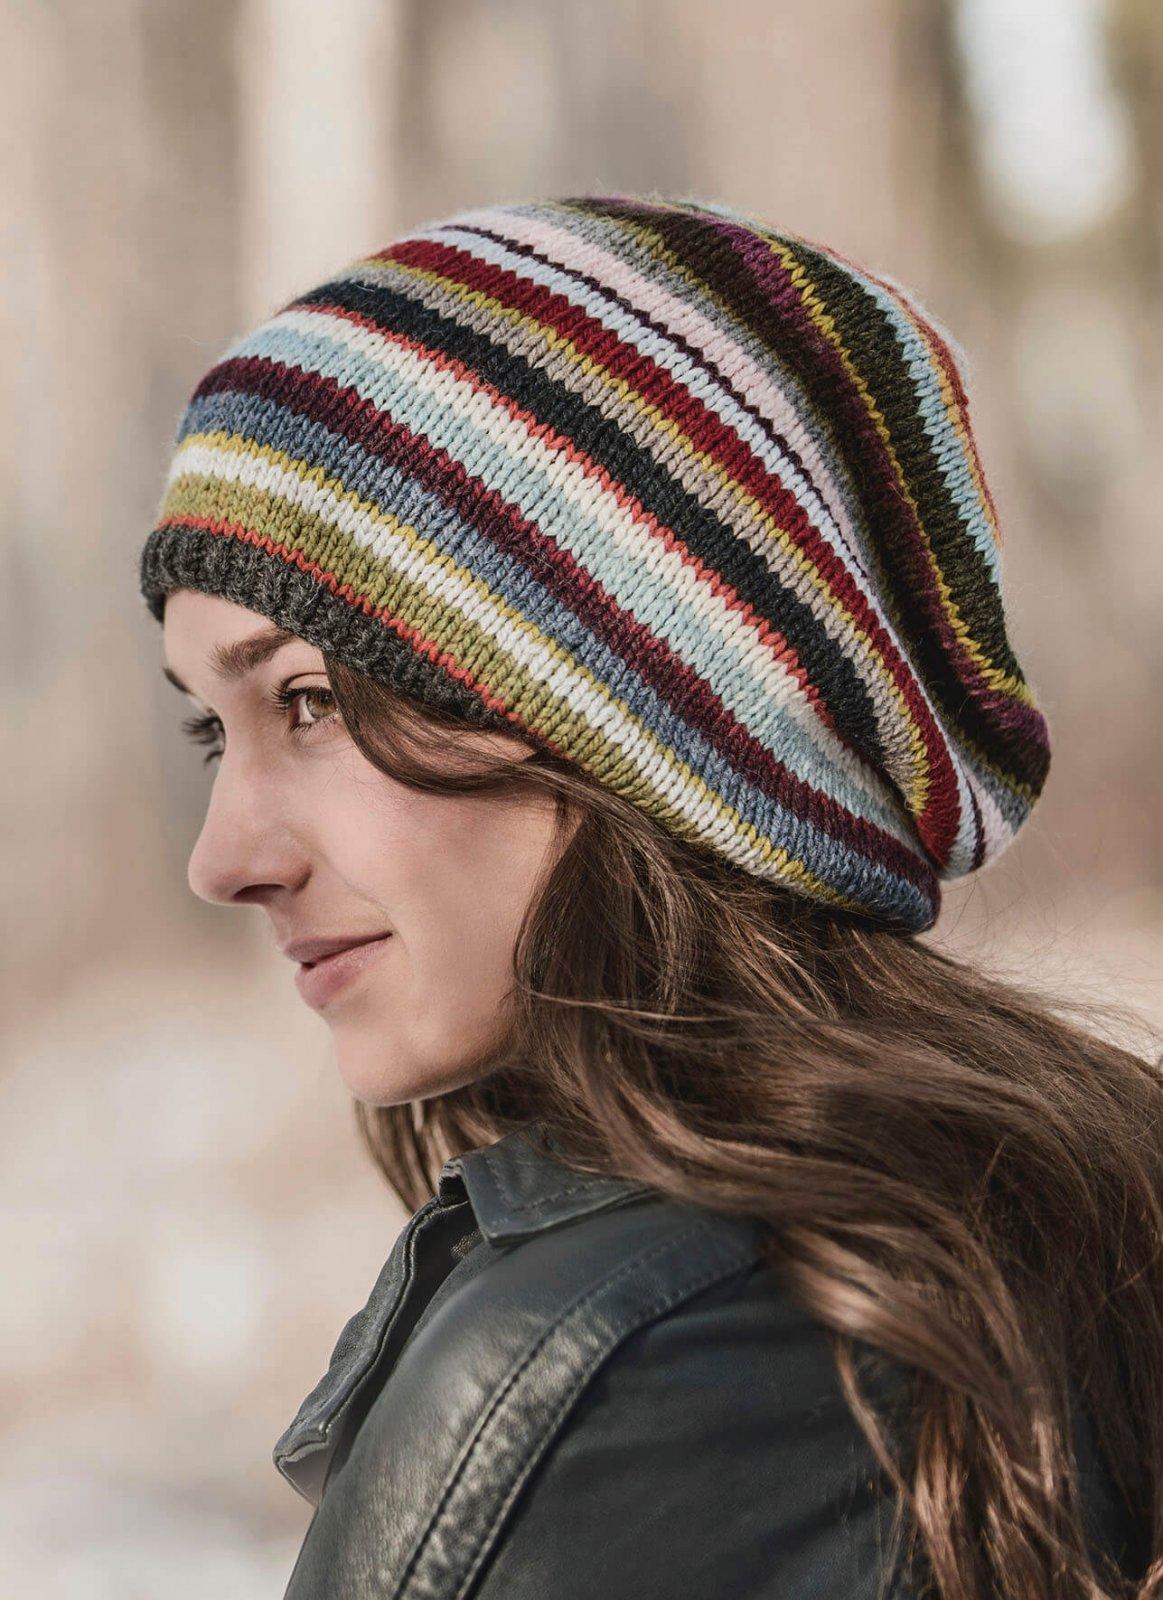 Blue Sky Fibers - 21 Color Slouch Hat Kit - Woolstok